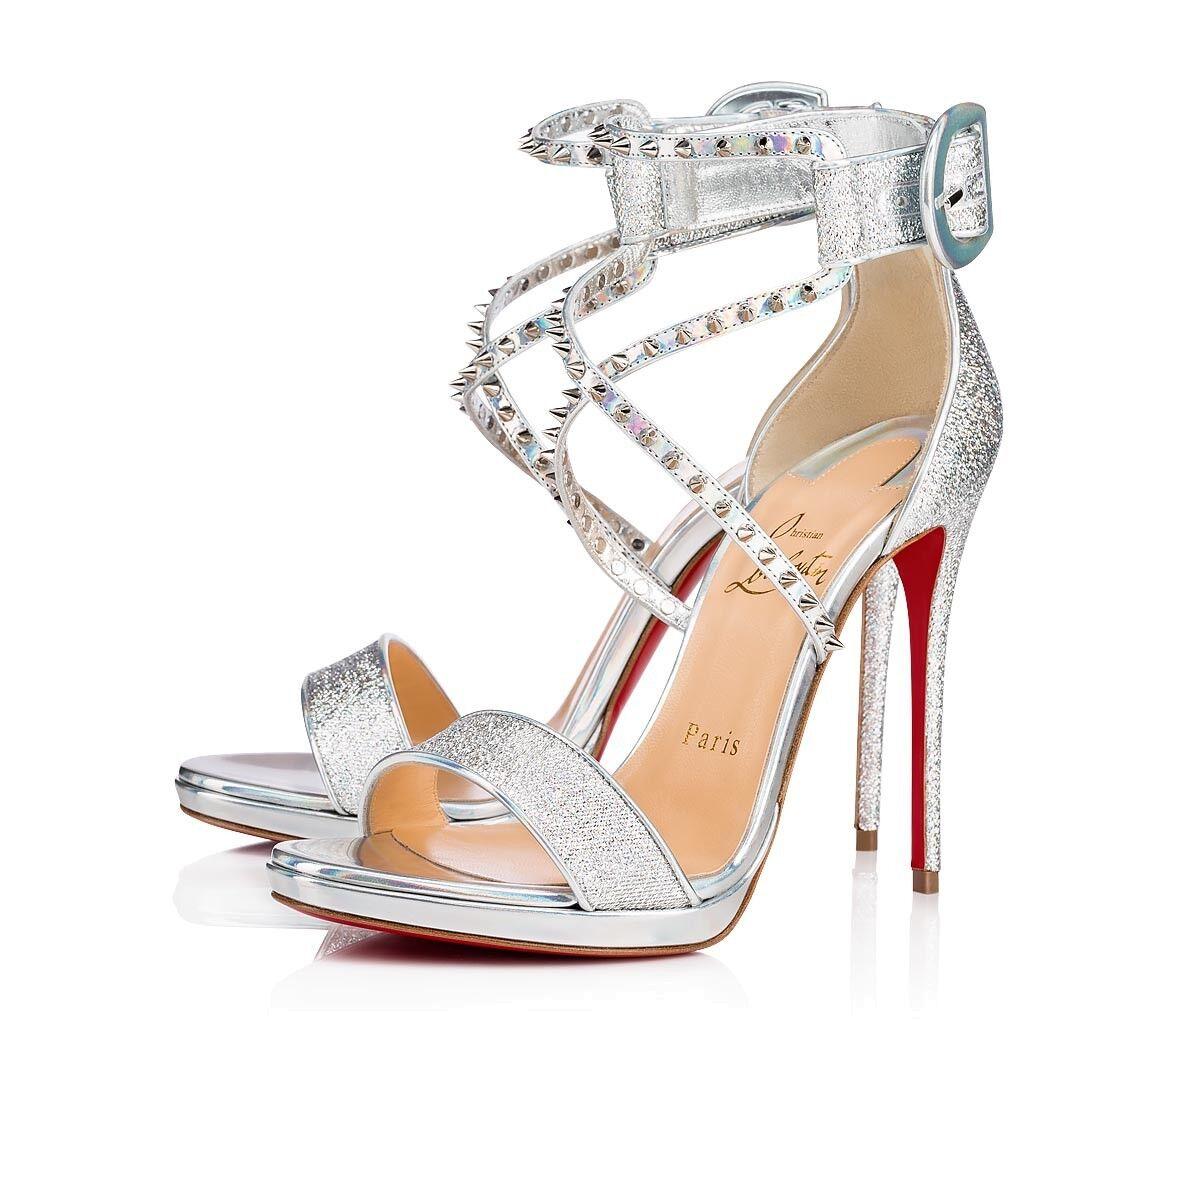 Christian Louboutin Choca Lux 120 Silver Criss Cross Strap Sandal Heel Pump 37.5